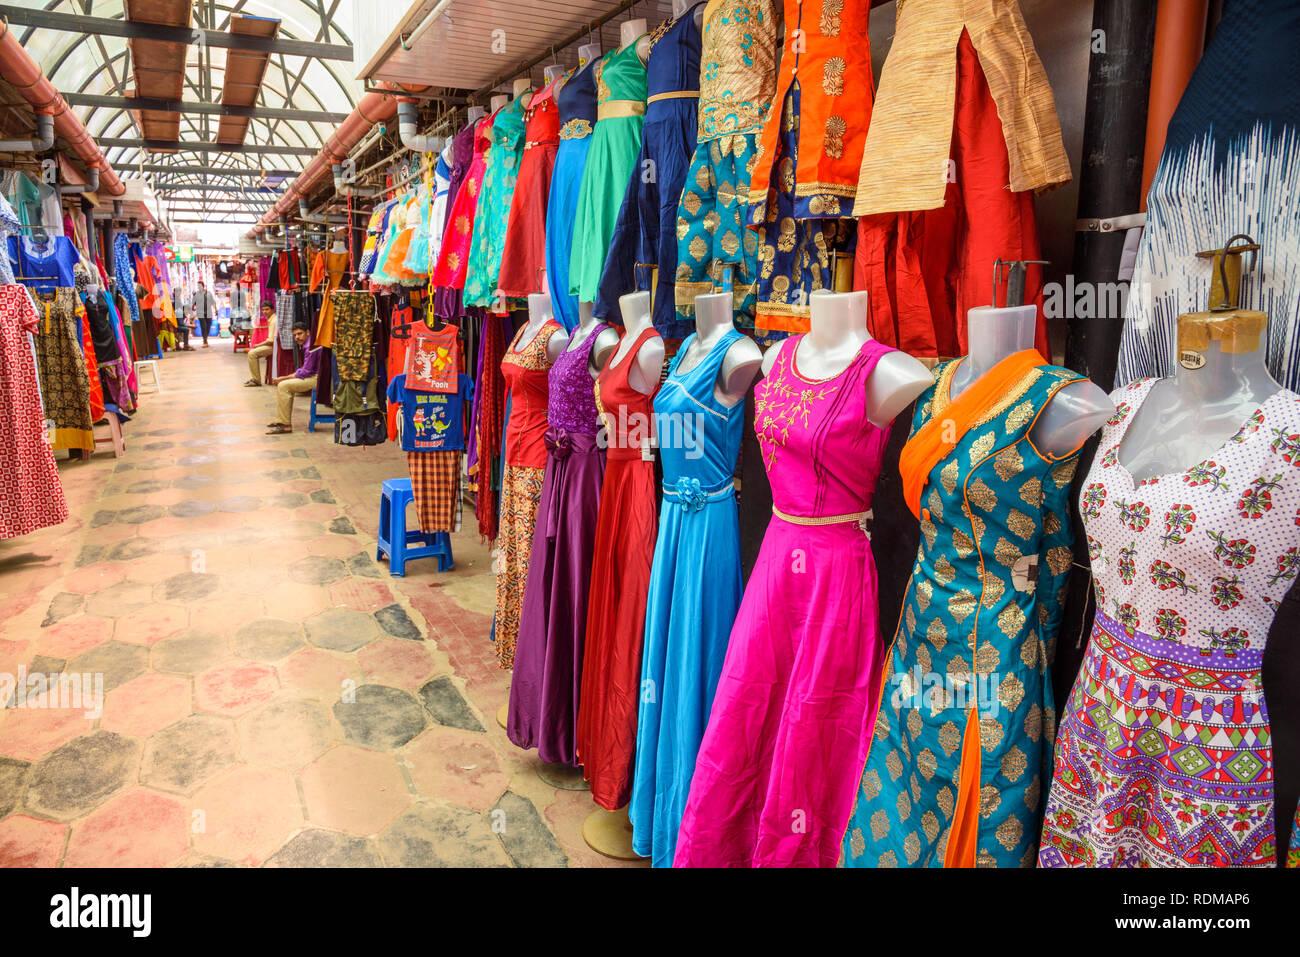 Mercato Conemara, Trivandrum, Kerala, India Immagini Stock